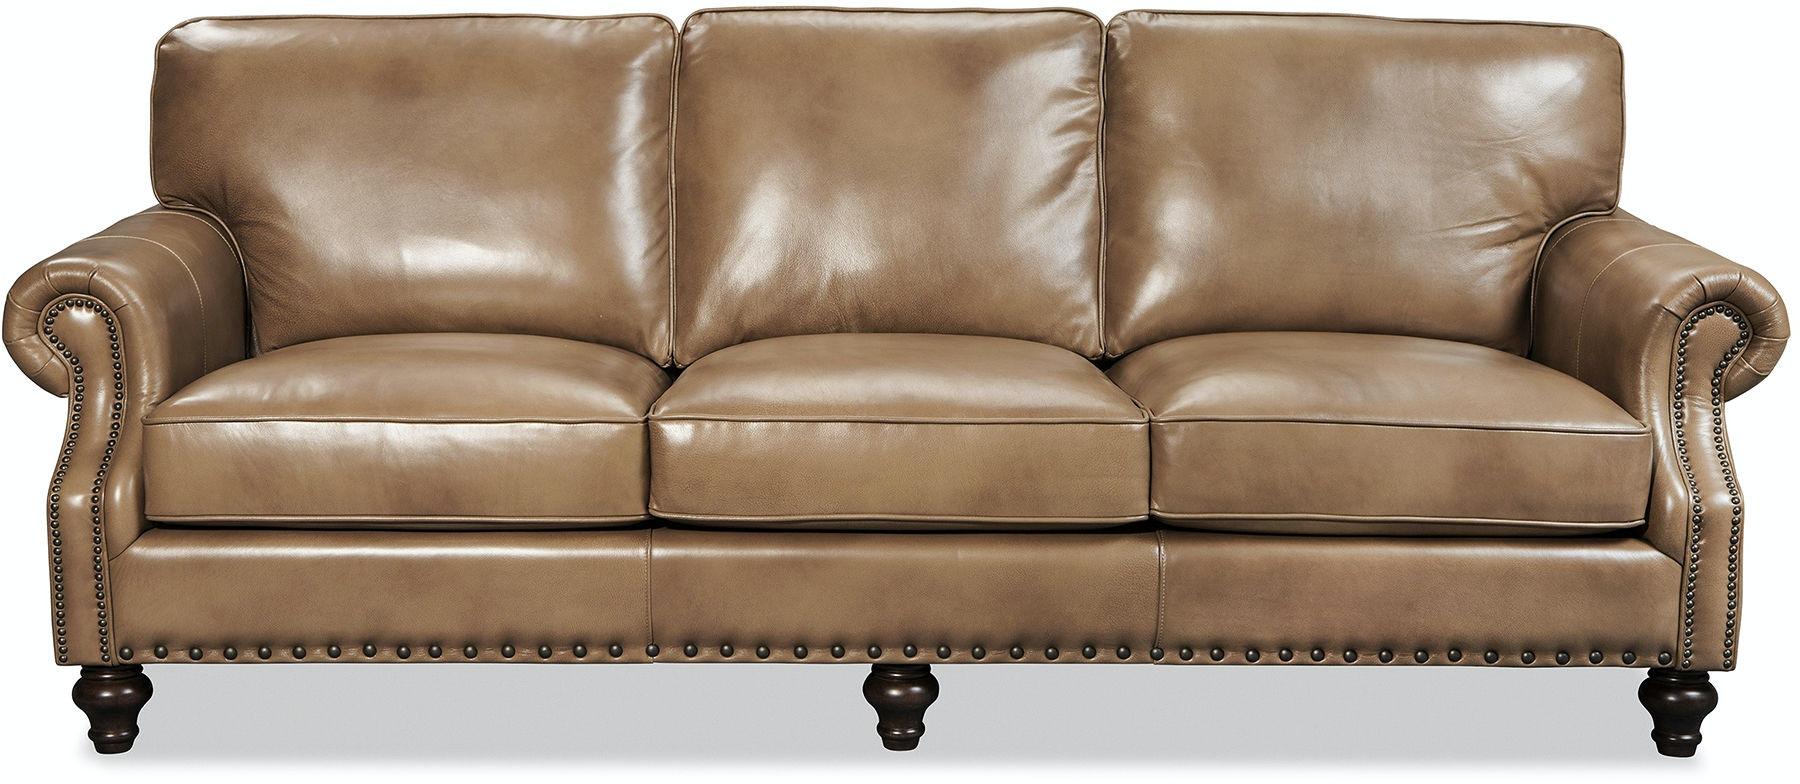 Craftmaster Living Room Sofa L171450 High Point